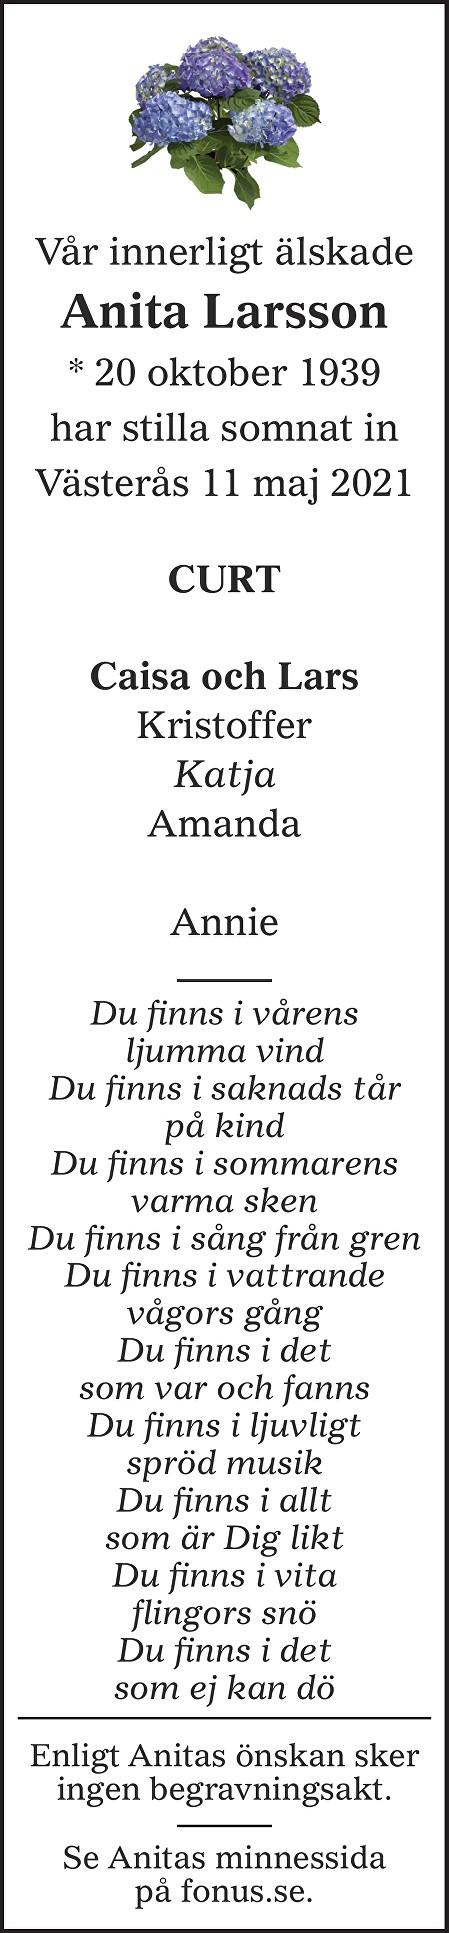 Anita Larsson Death notice